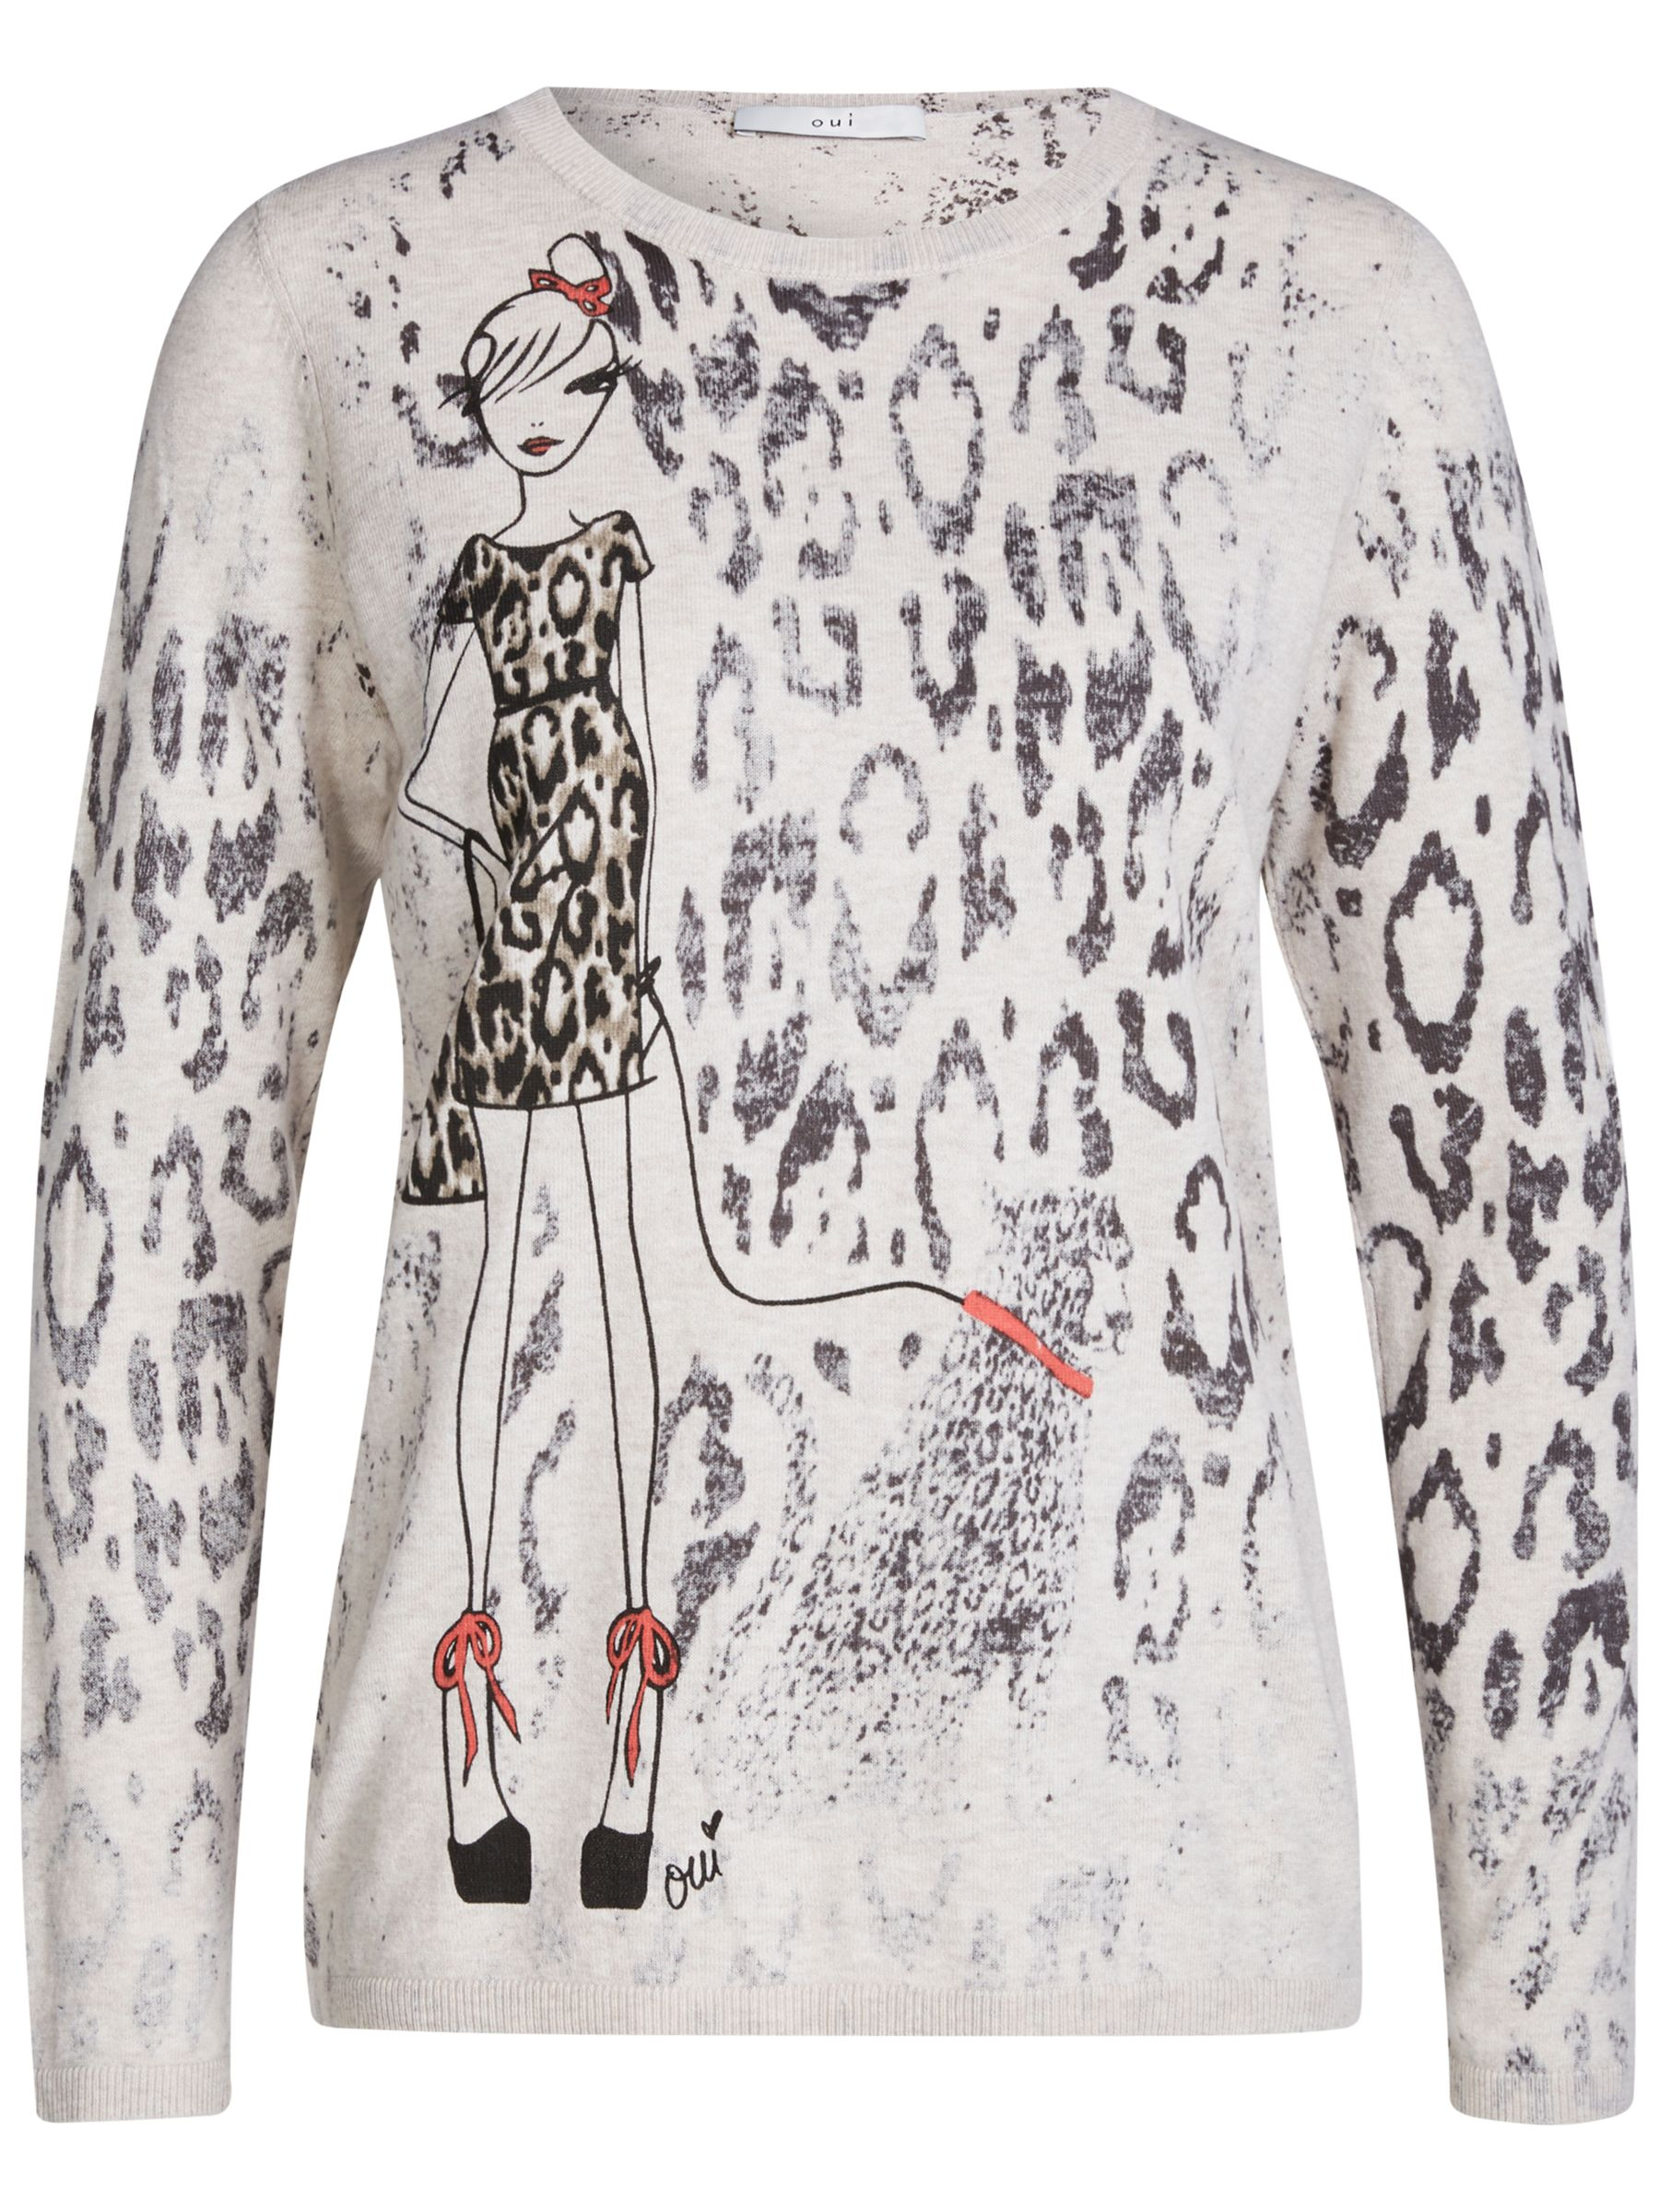 Oui Oui Lady Shipping Knit Jumper, Camel/Grey